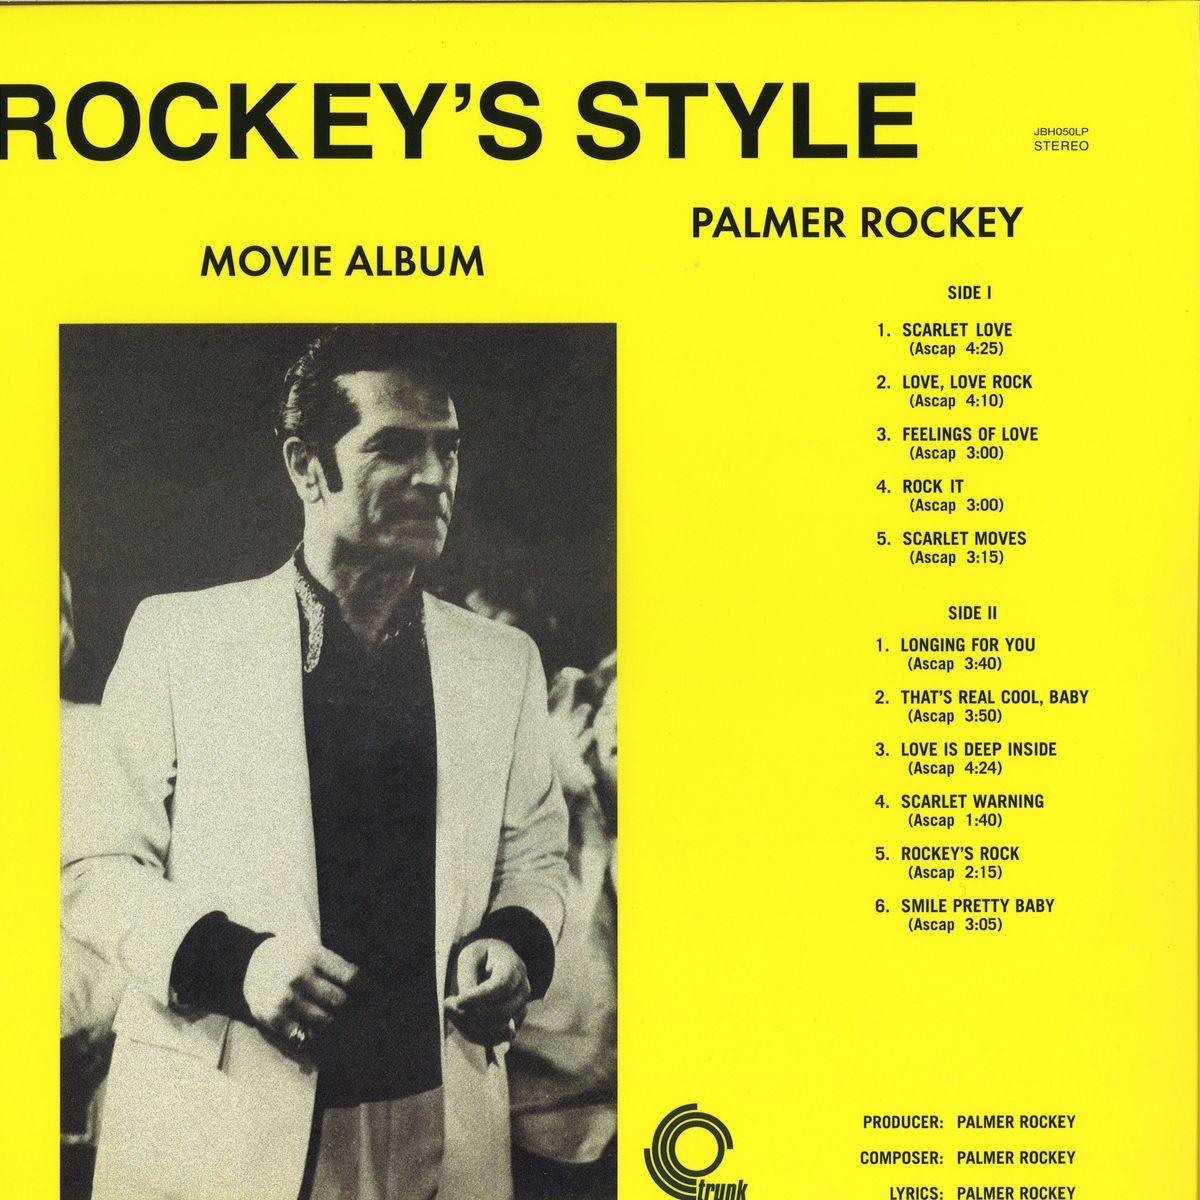 Palmer Rockey Rockeys Style